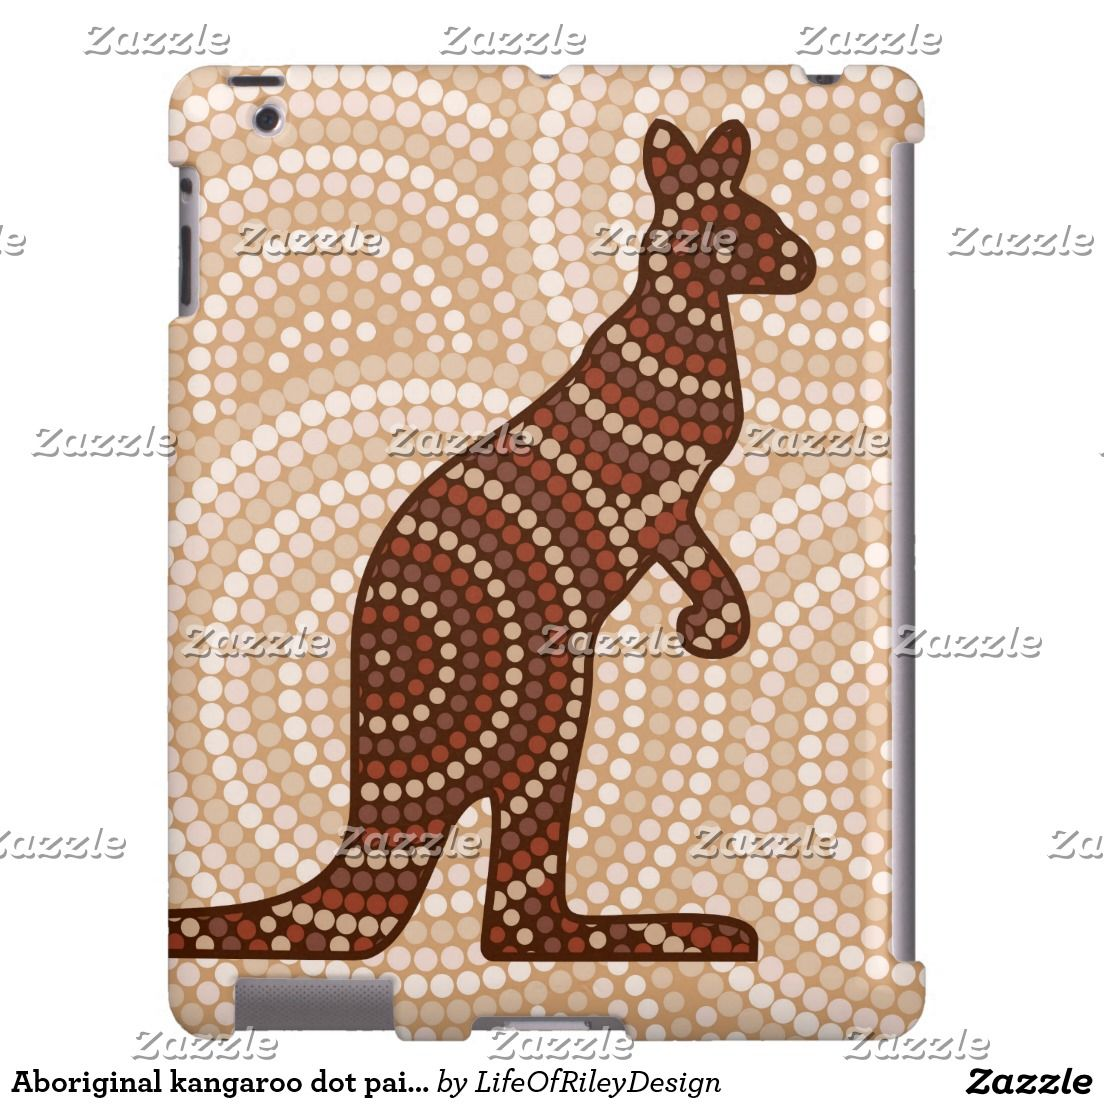 Aboriginal Kangaroo Dot Painting